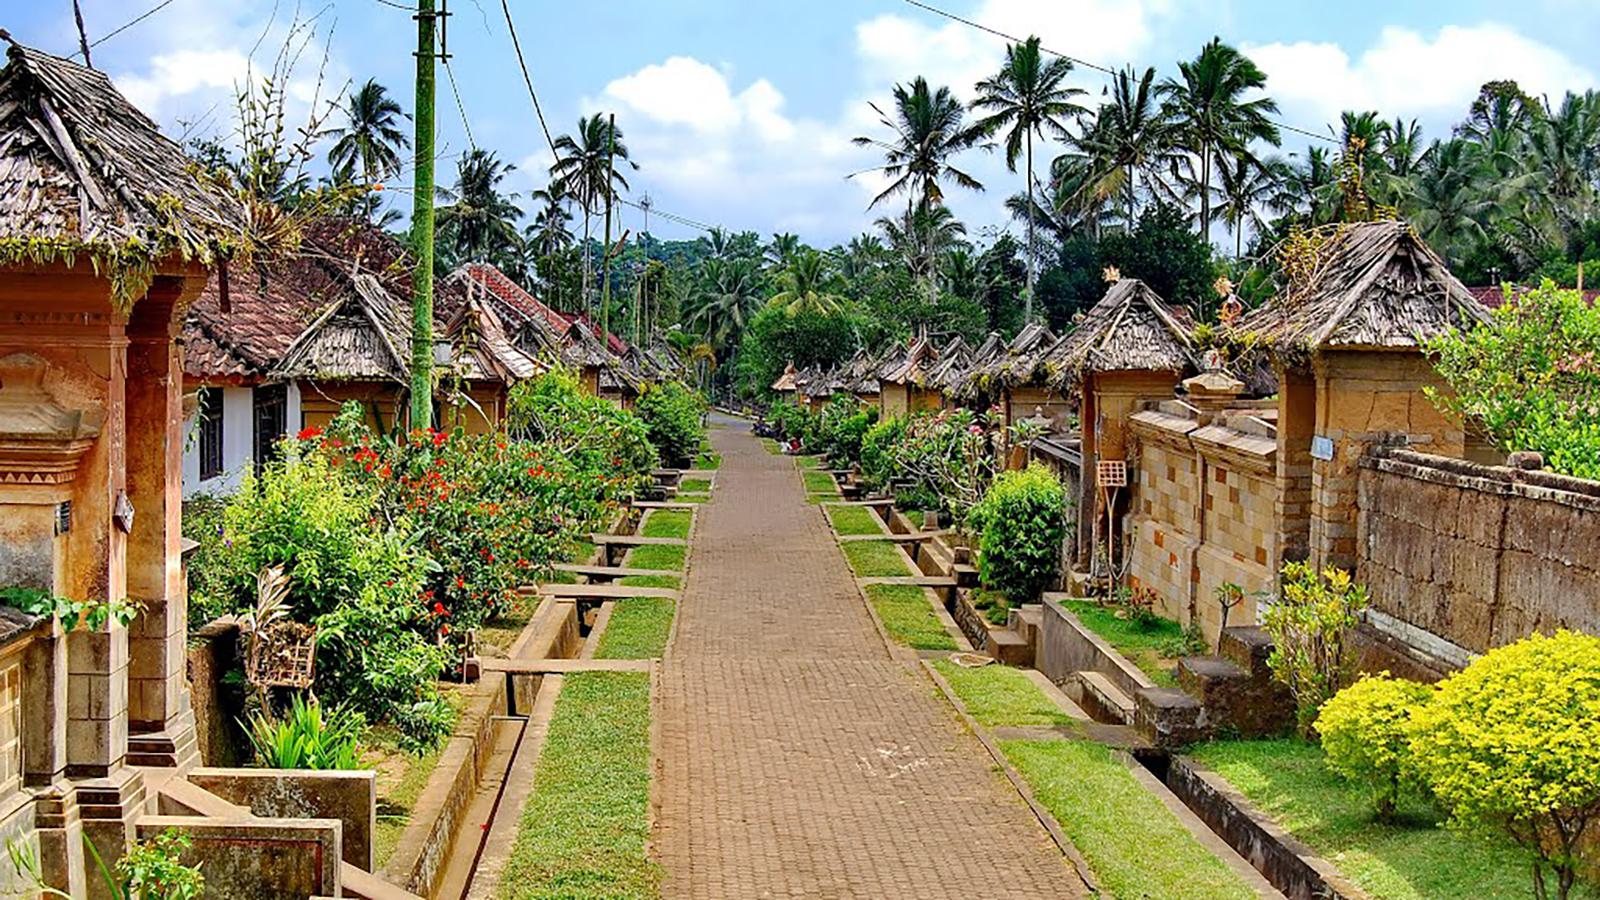 the ancient village of penglipuran in bangli regency